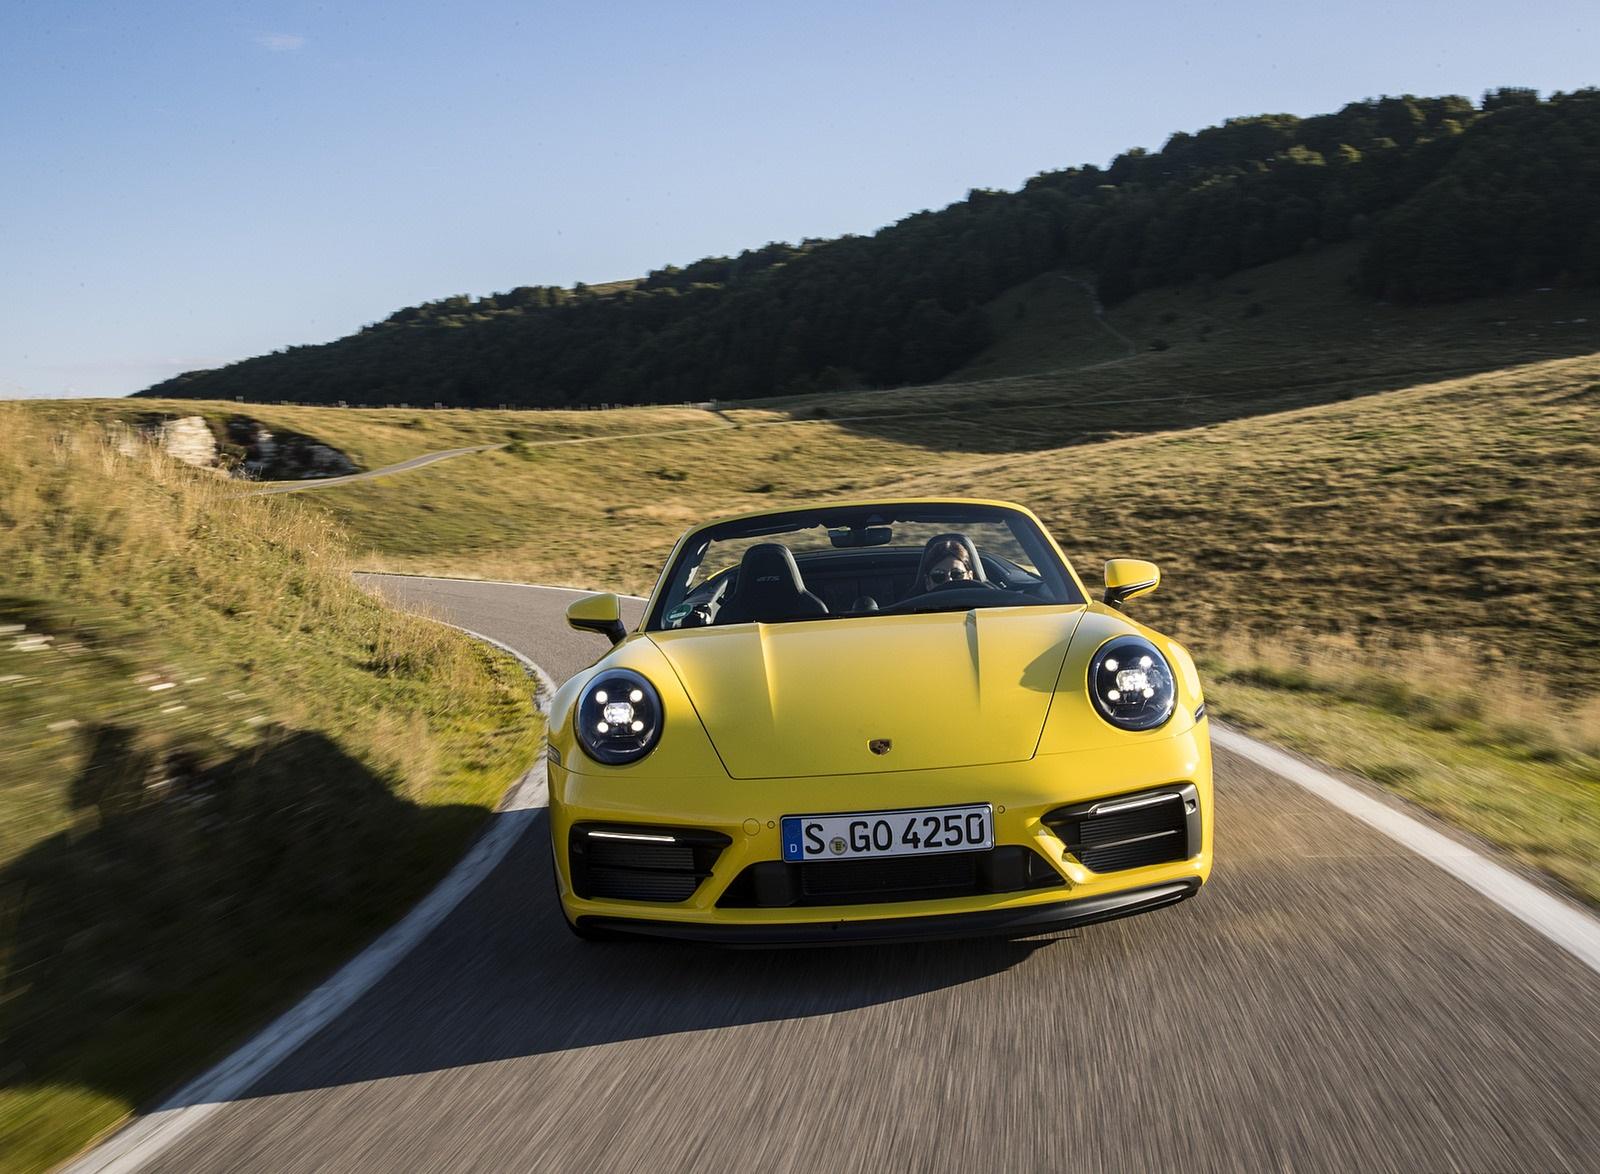 2022 Porsche 911 Carrera GTS Cabriolet (Color: Racing Yellow) Front Wallpapers (2)